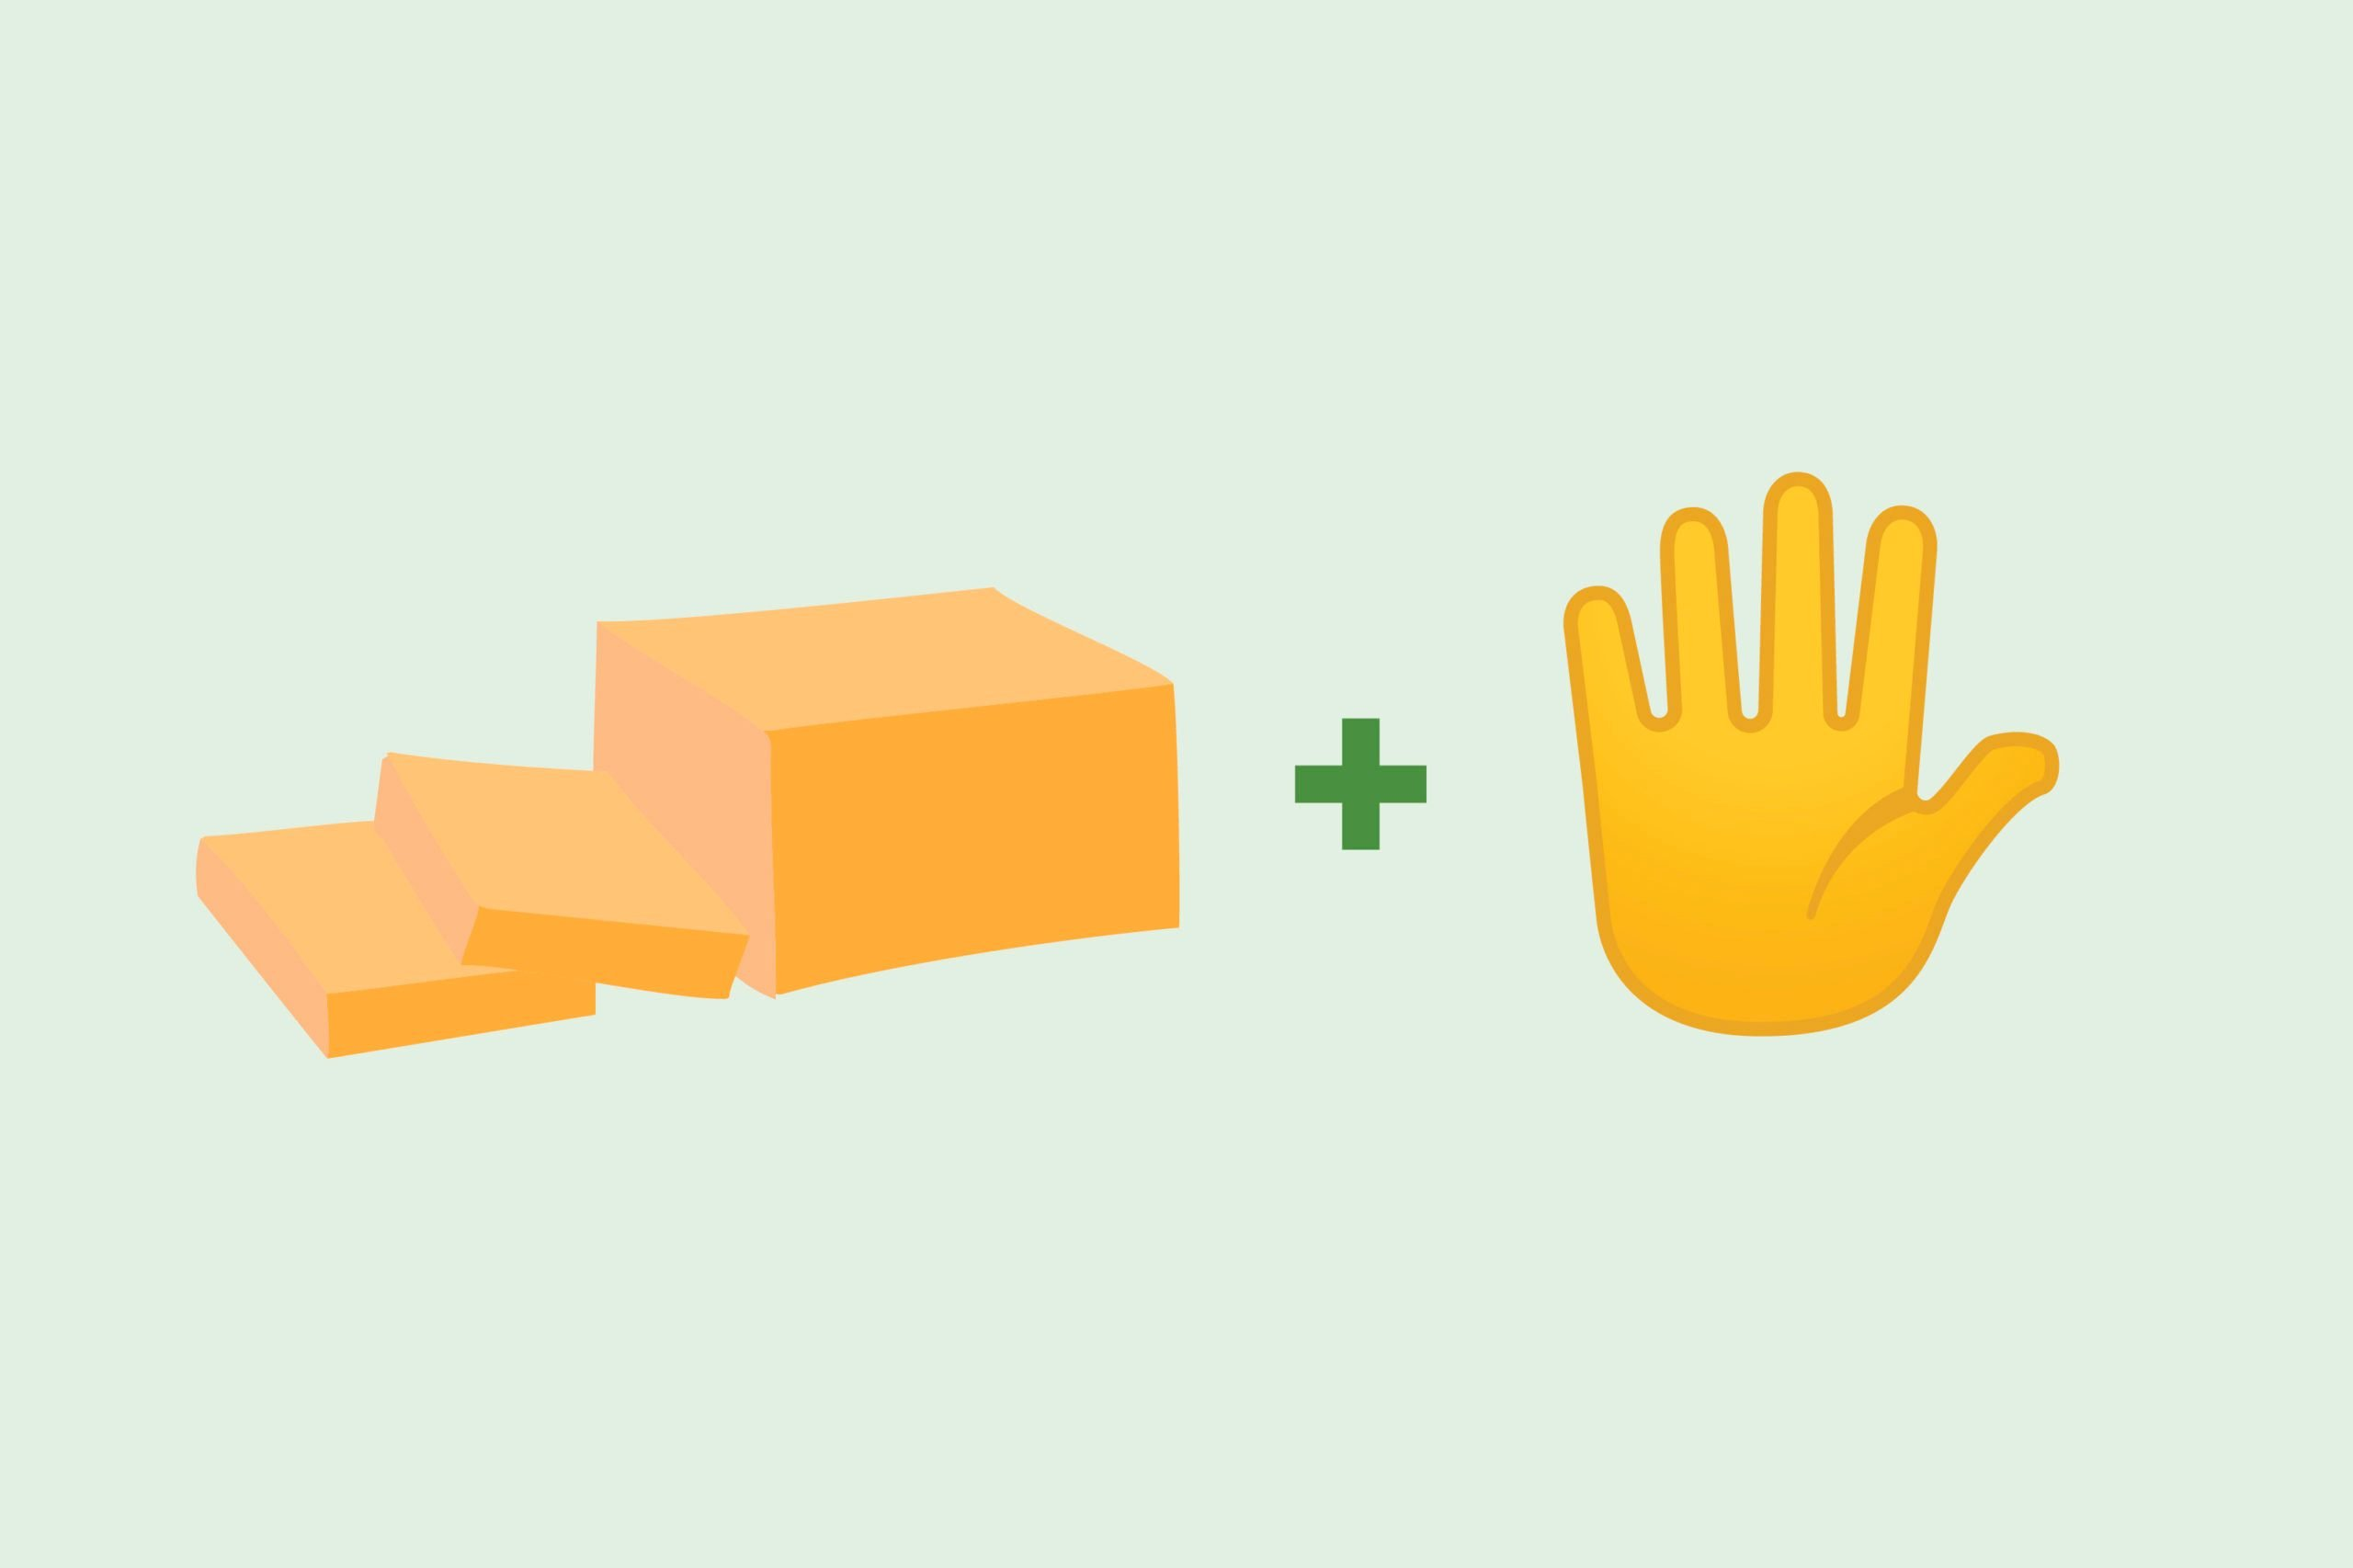 Butter emoji + hand emoji